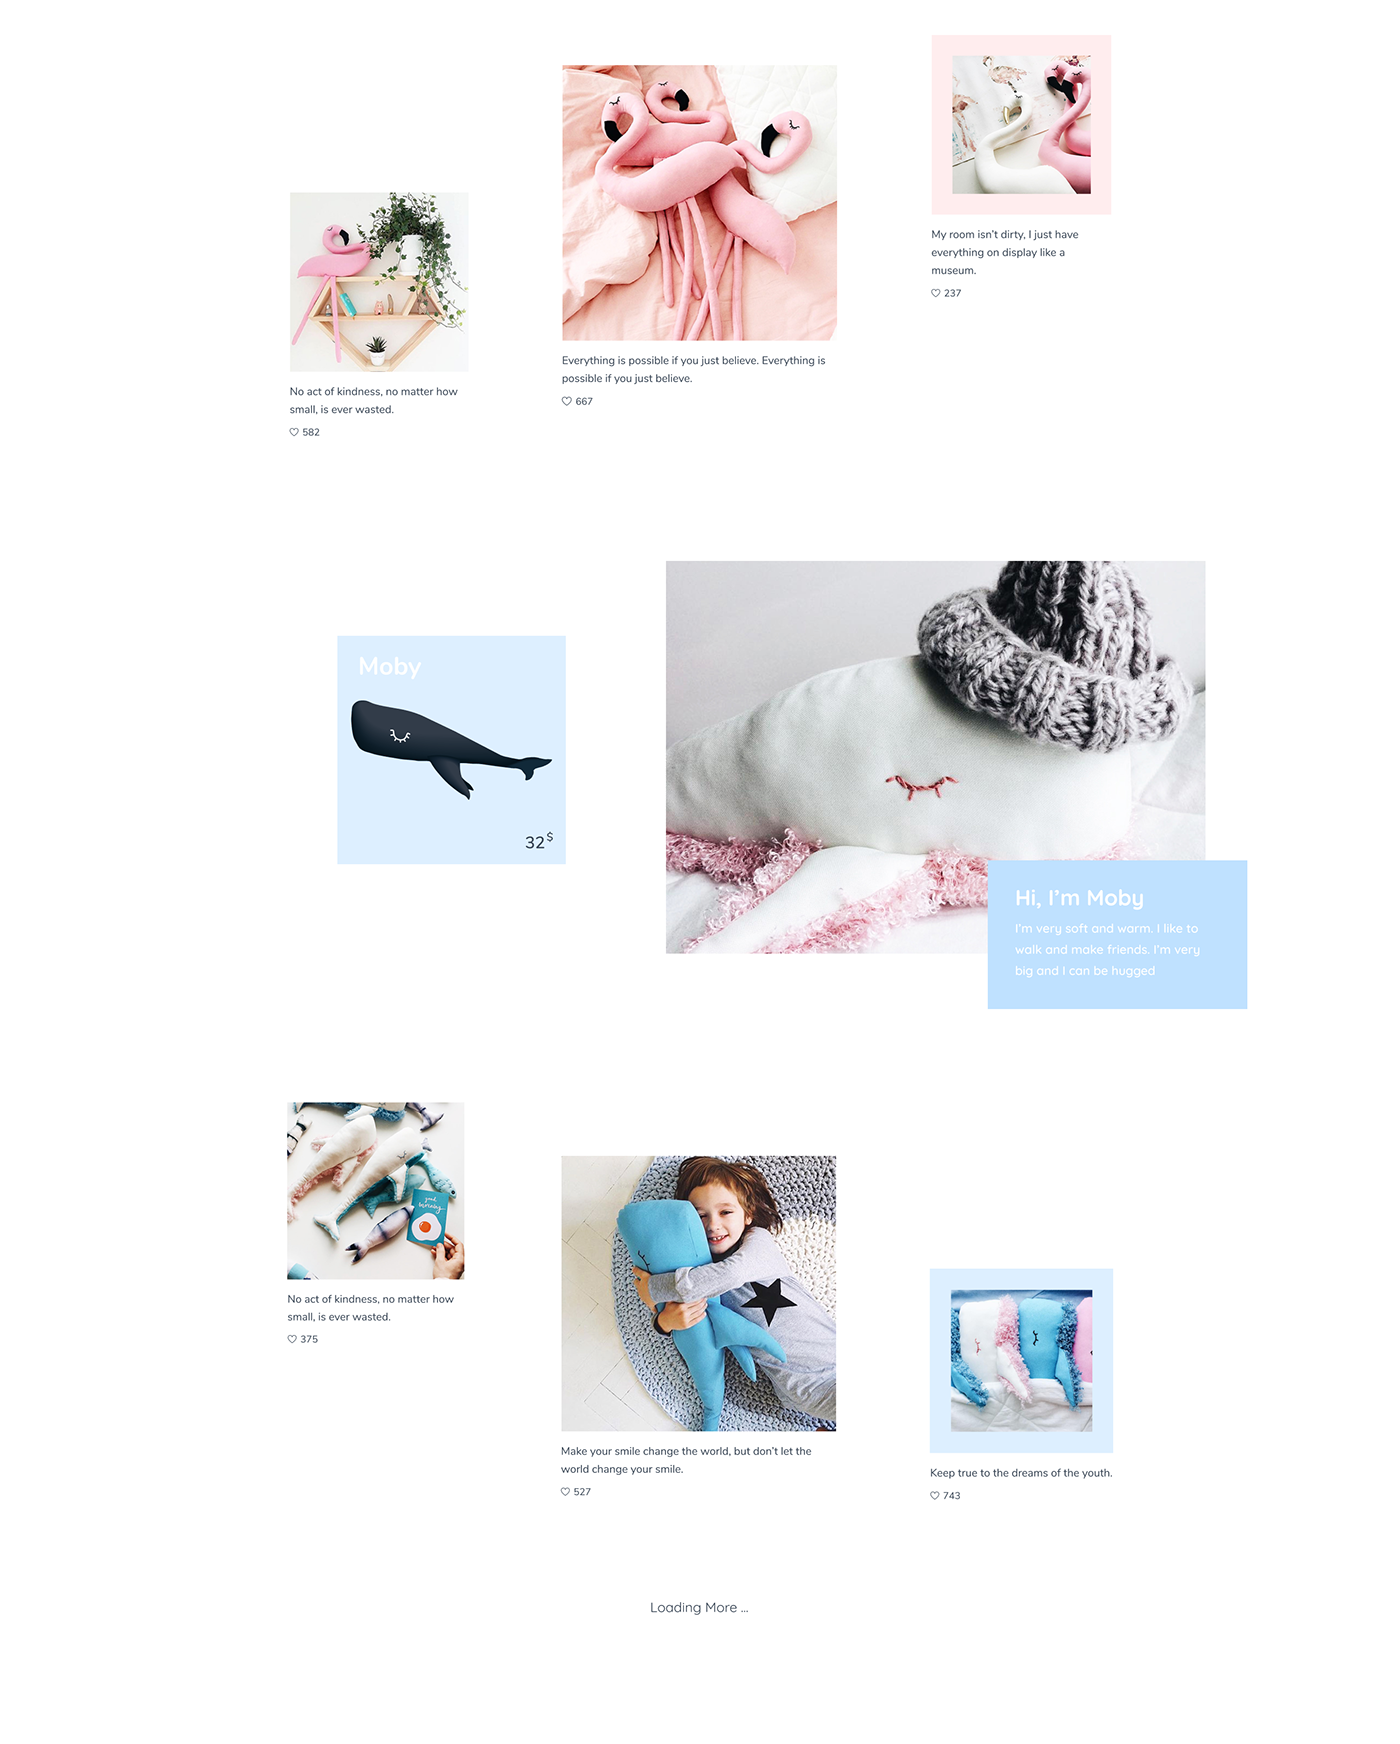 UI ux Web Design  web site Adobe XD Ecommerce animation  Website interaction parallax